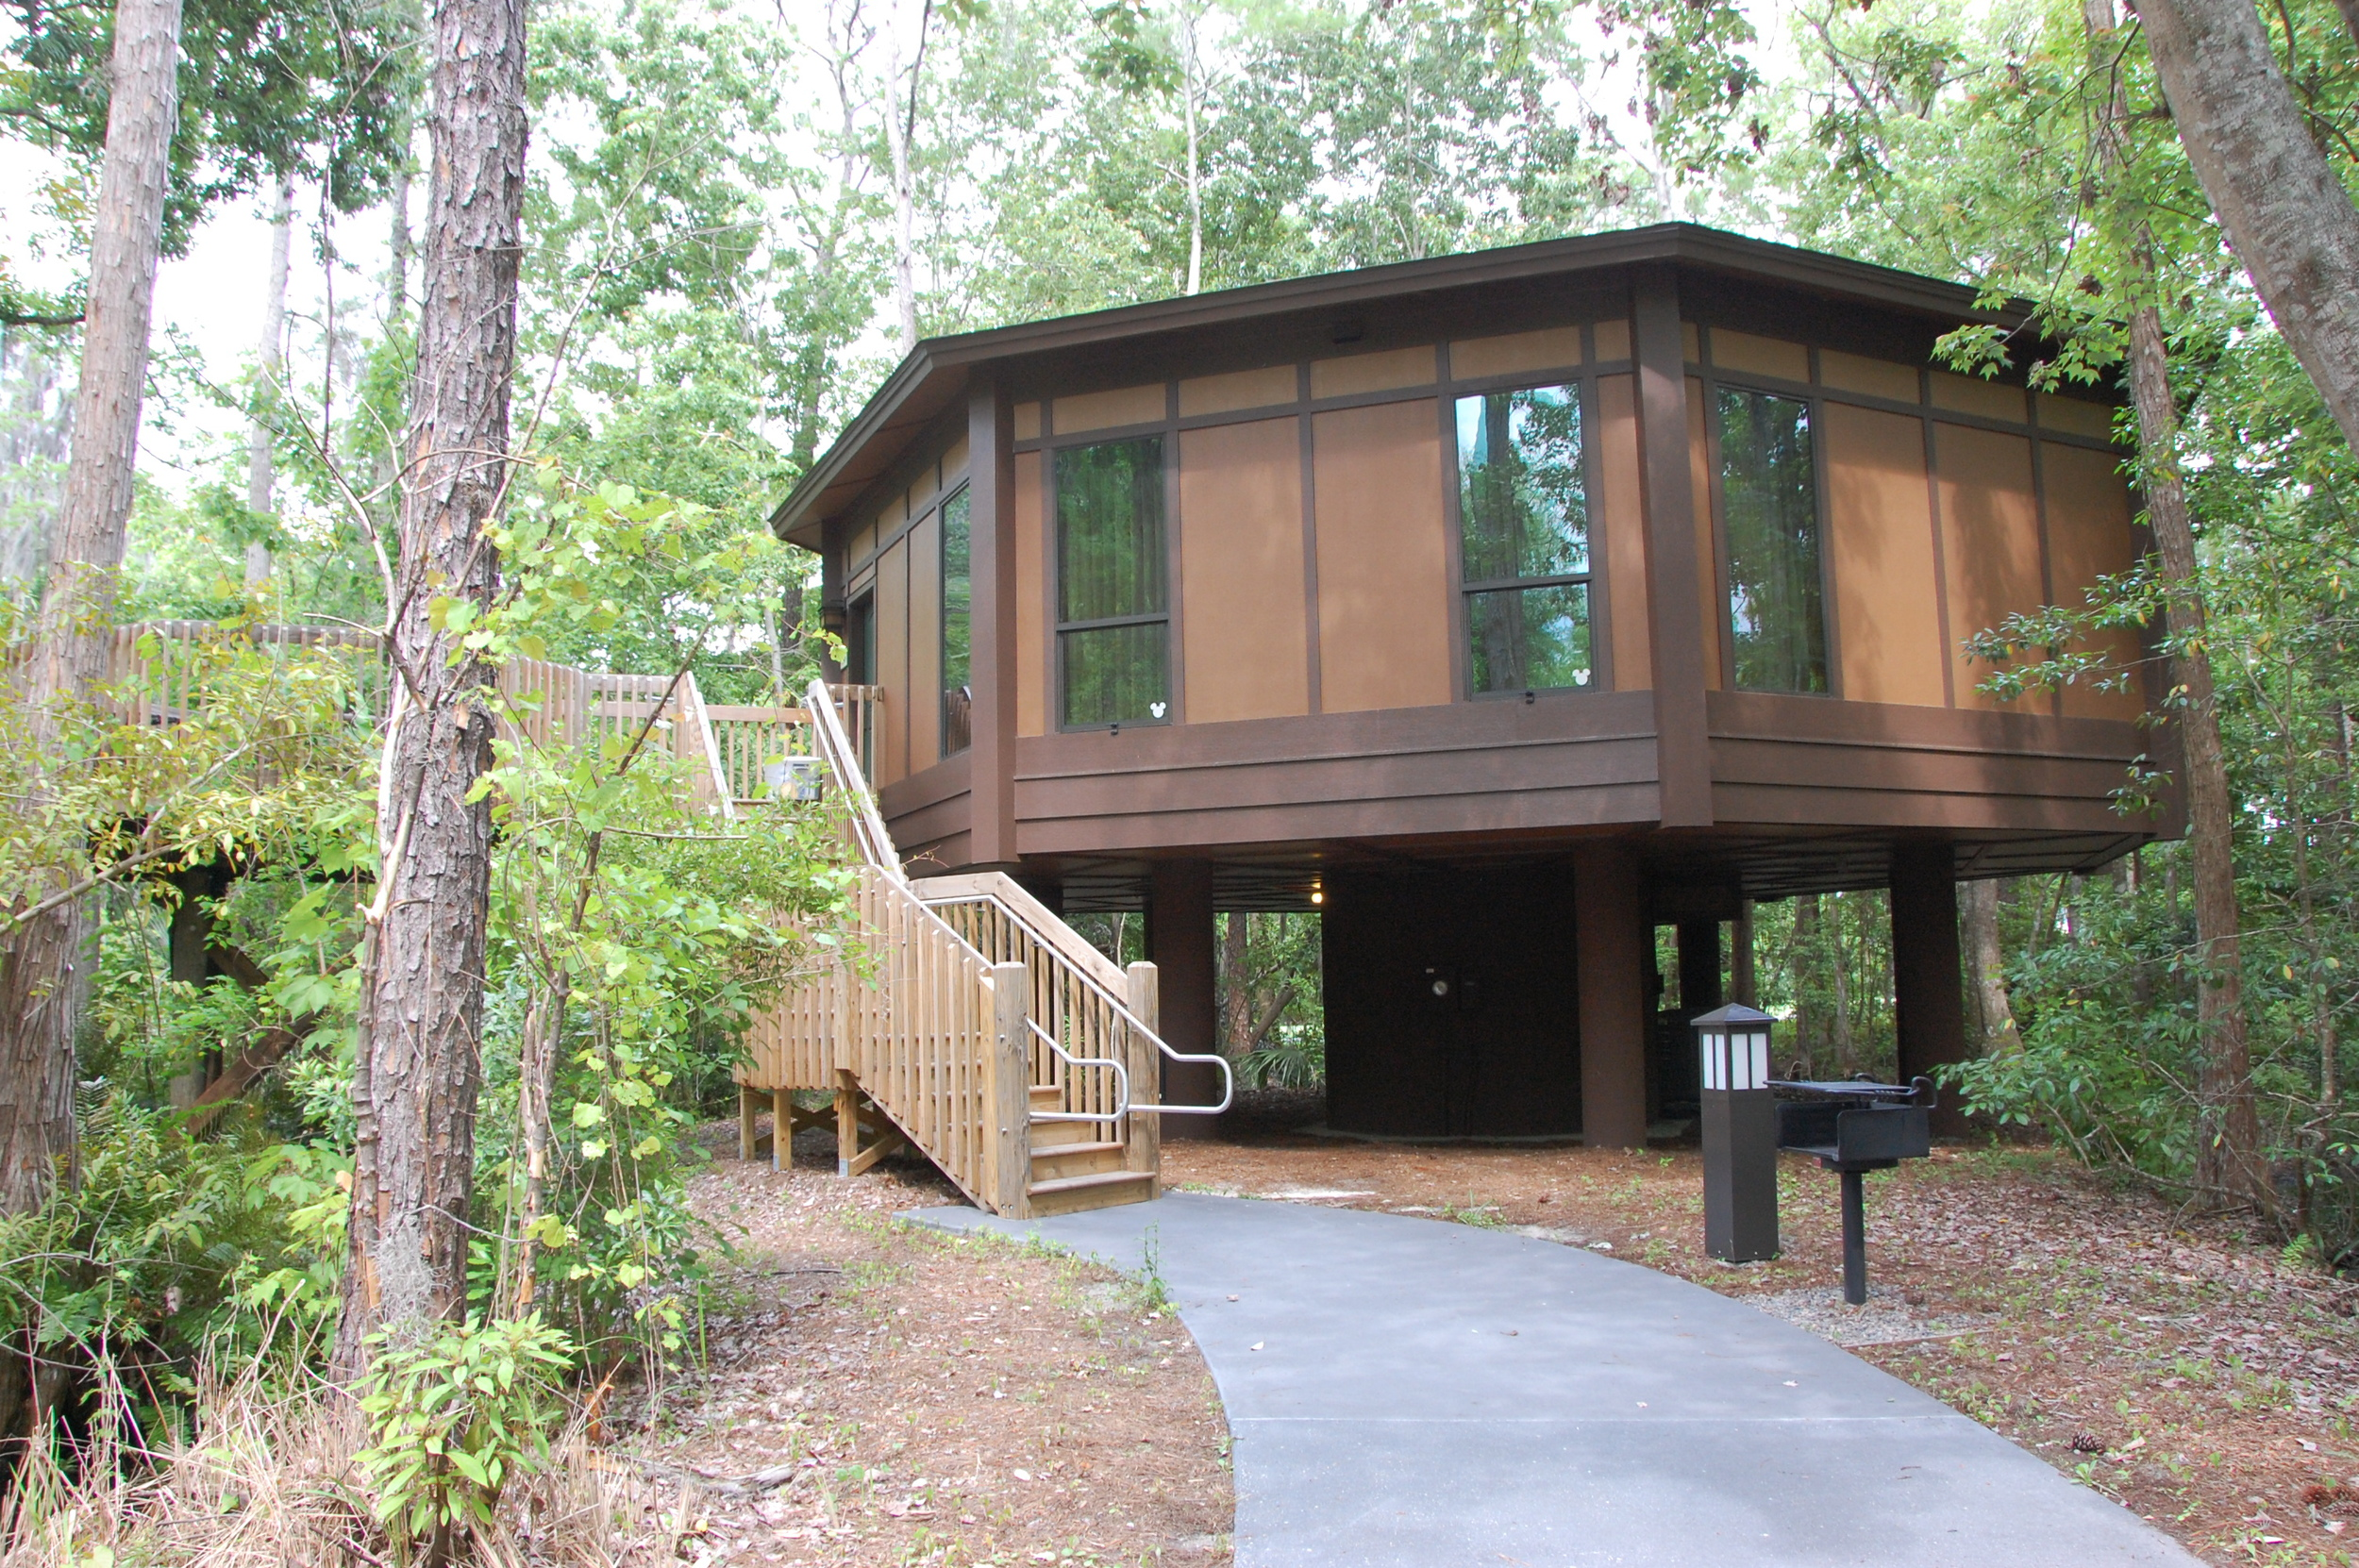 Saratoga Springs Treehouse Villas